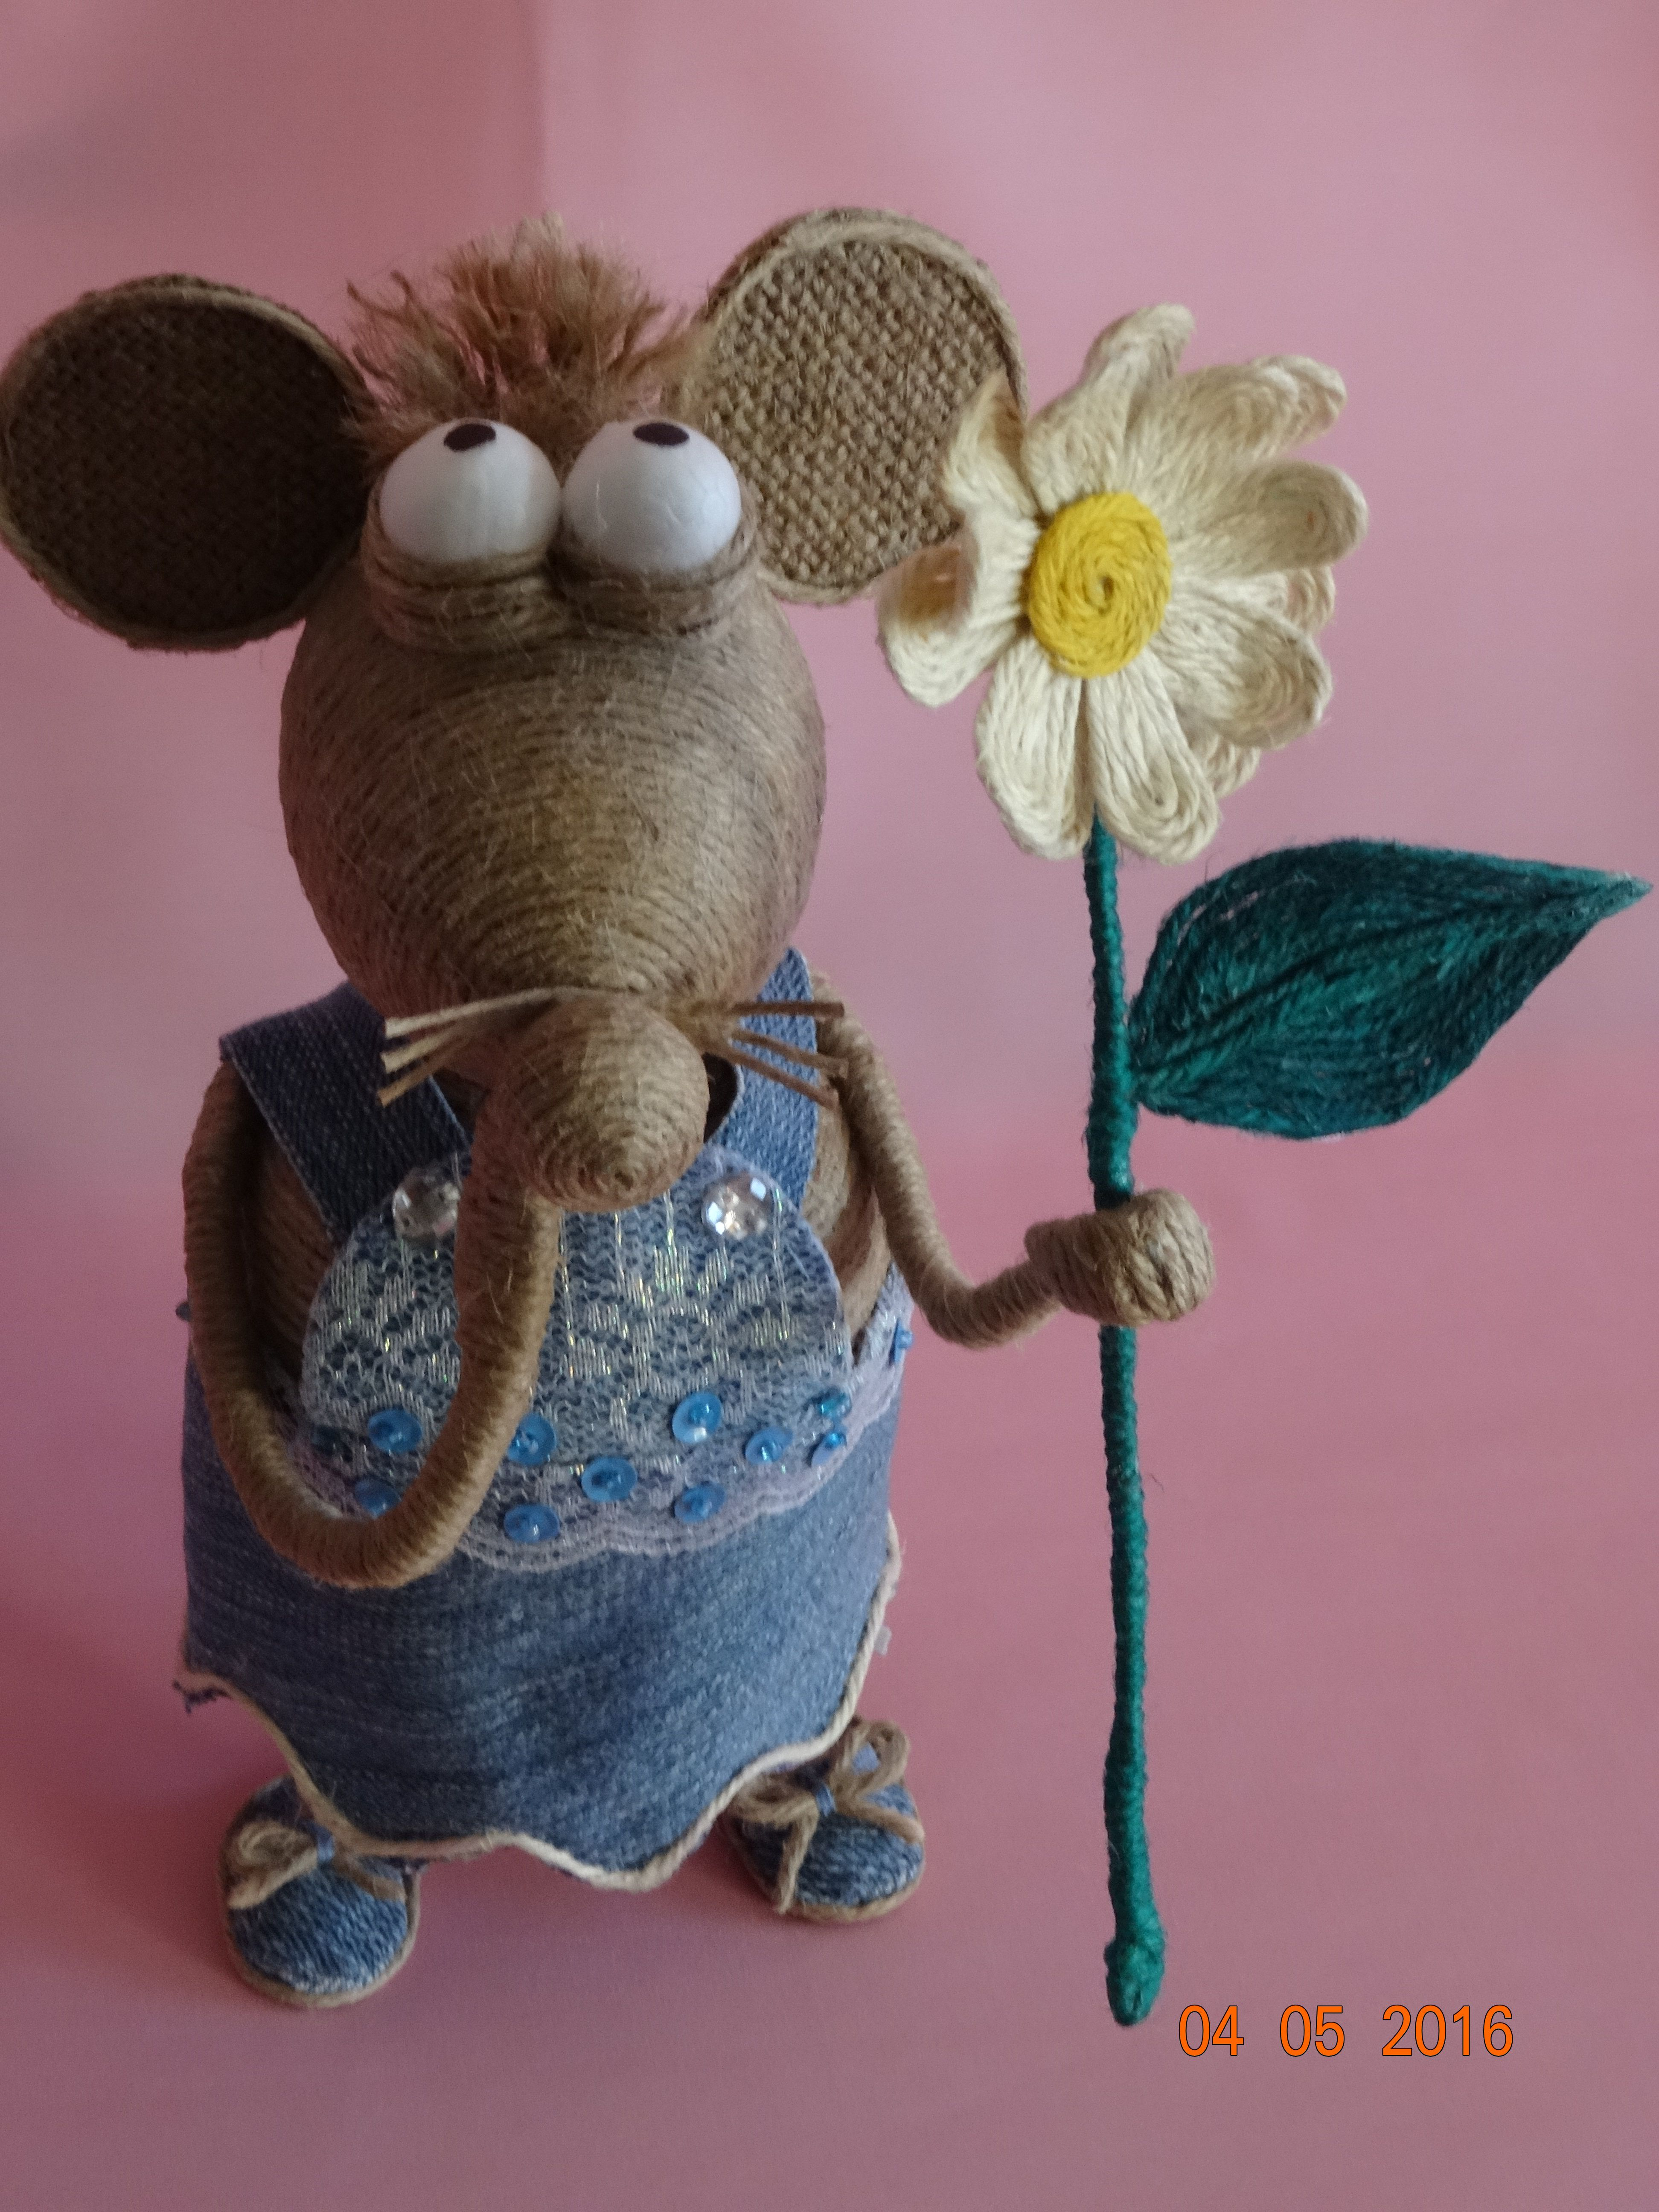 джутовый сувенир шпагат фигурка мышь